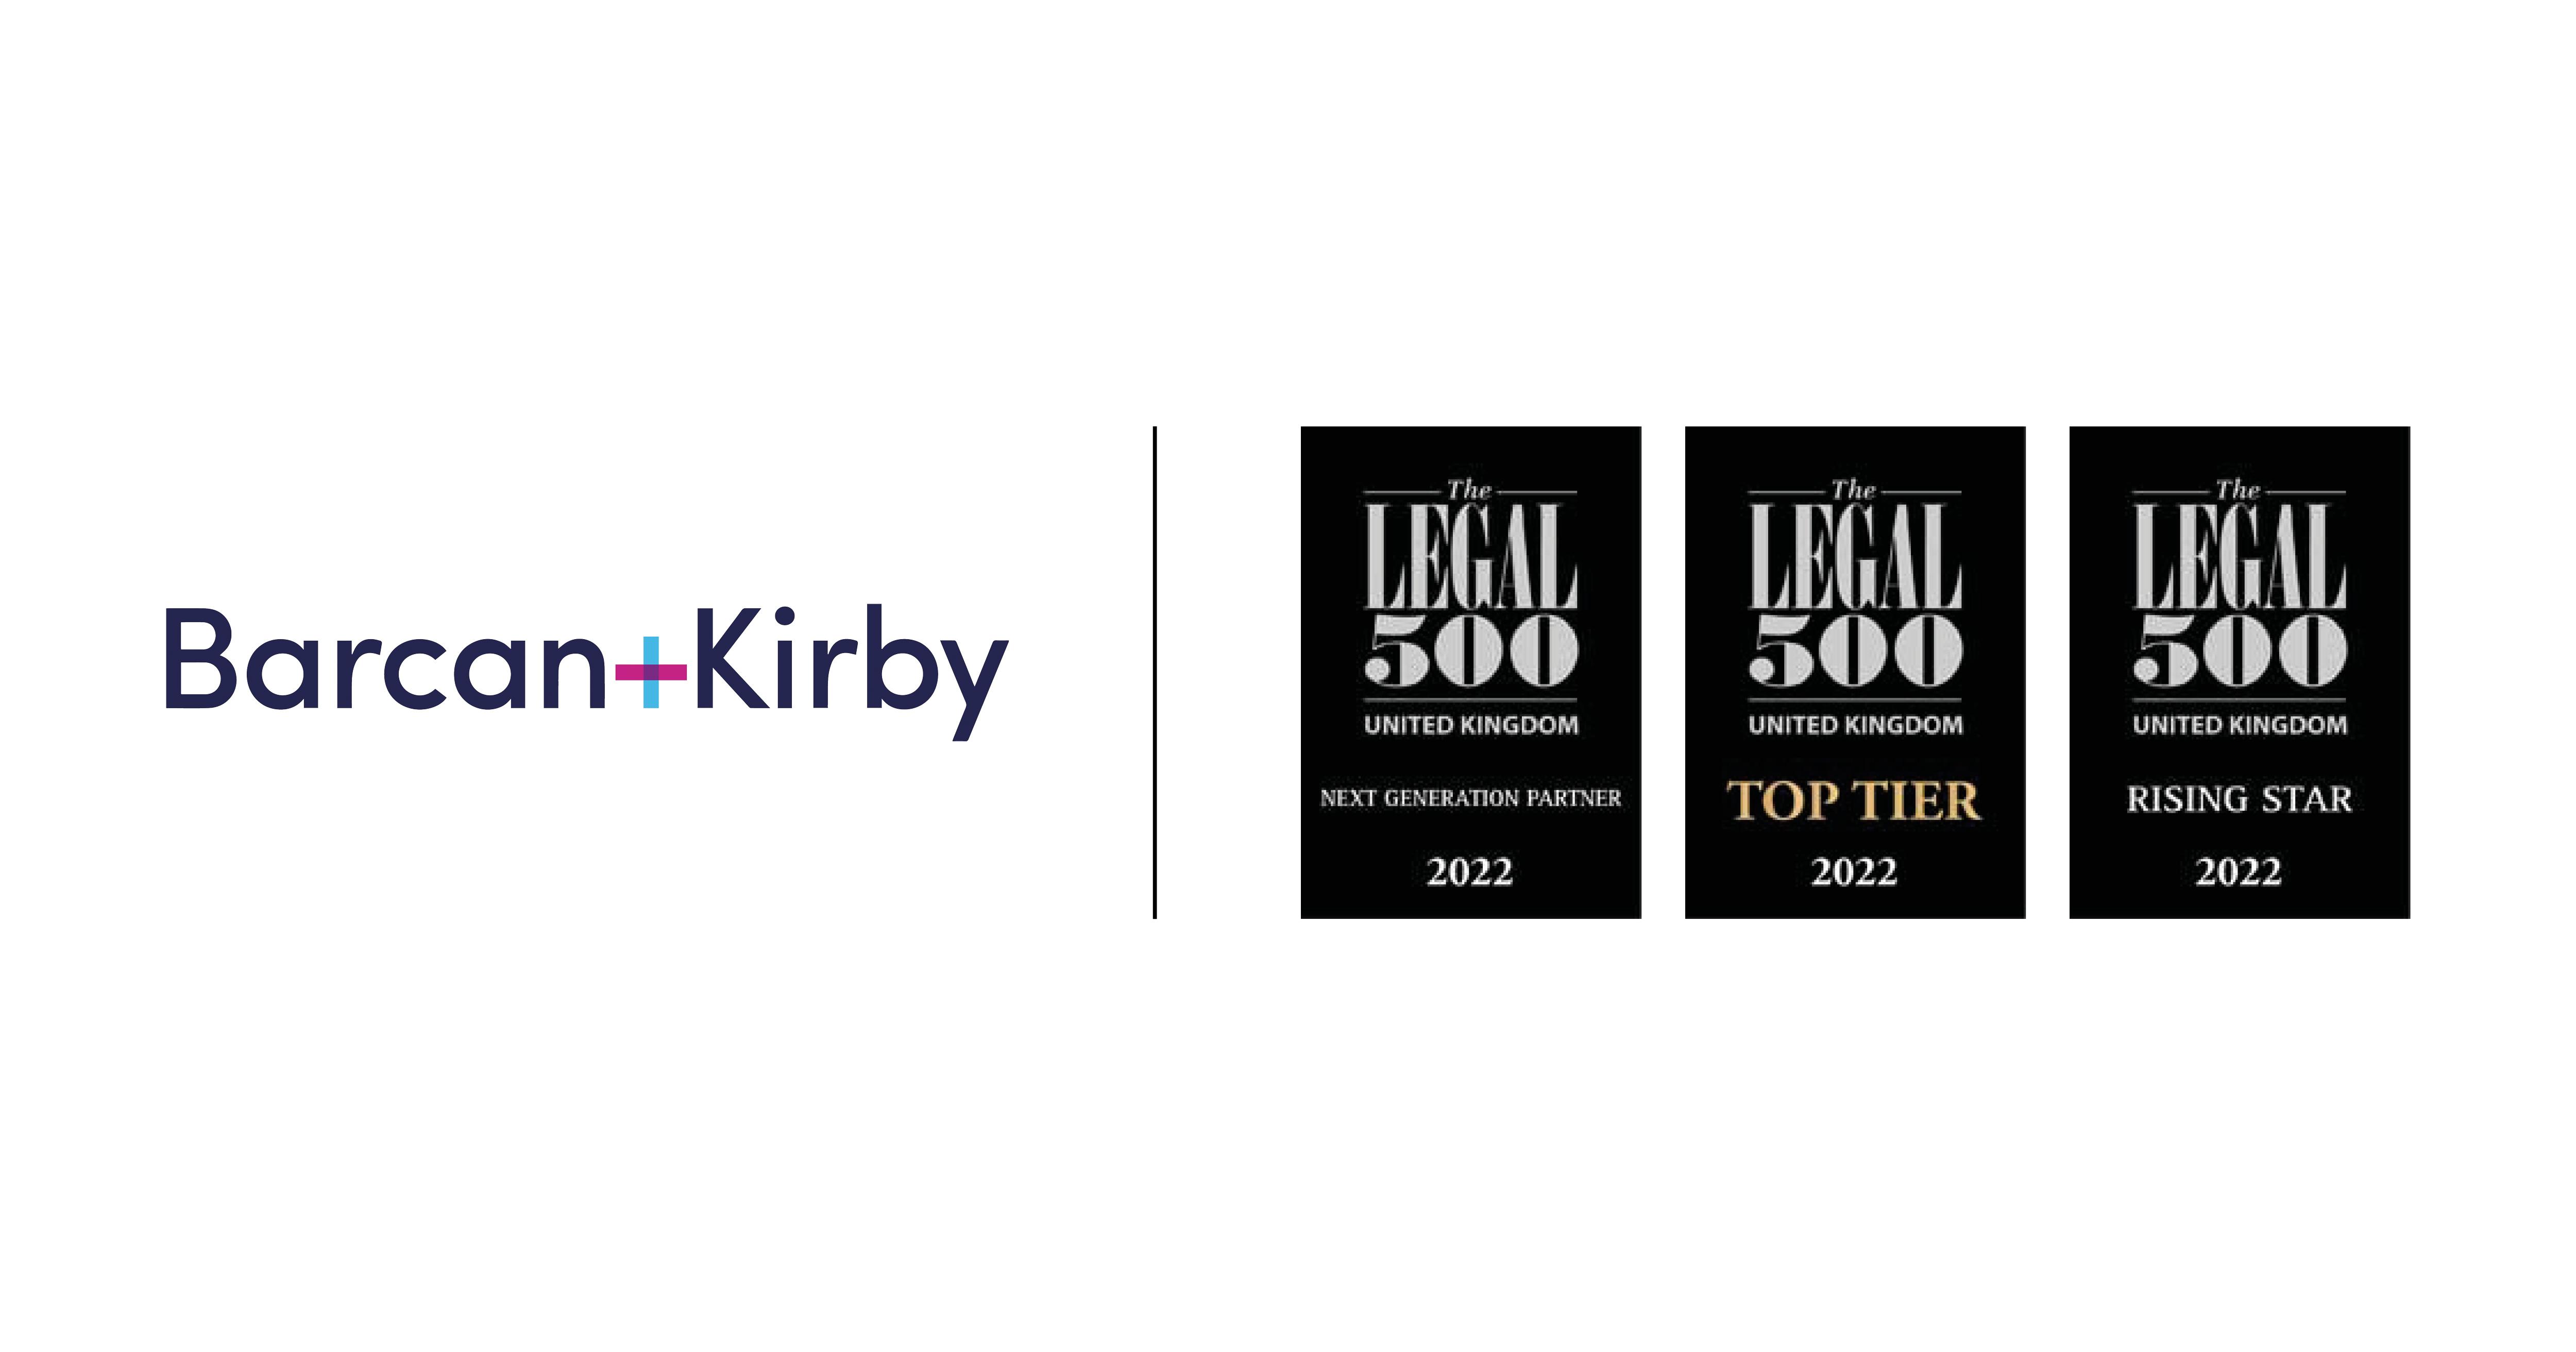 legal-500-2022-logos